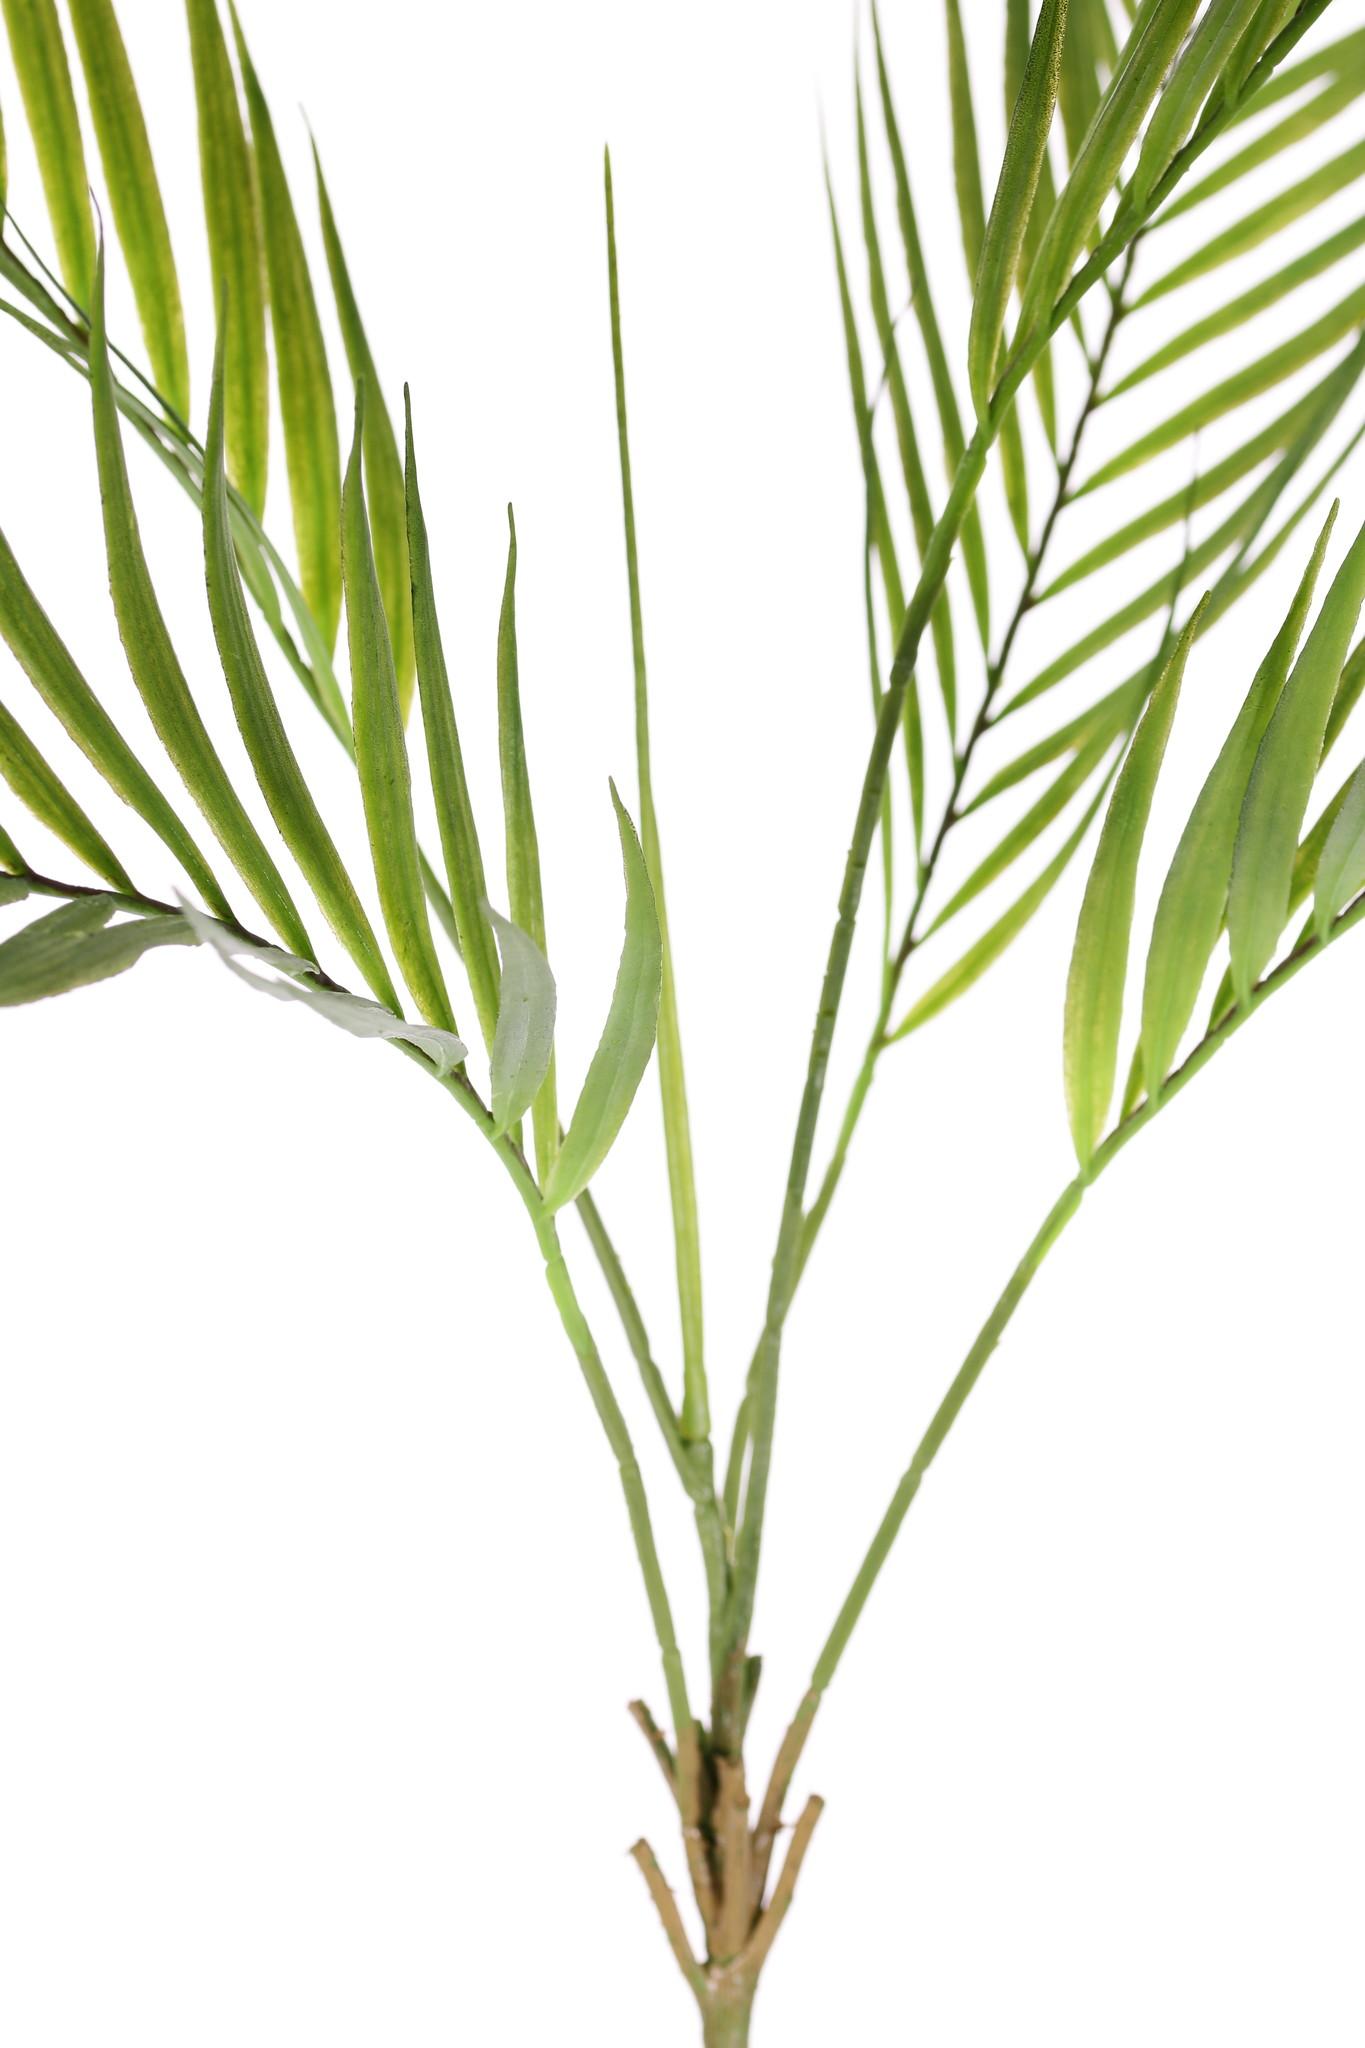 Arecapalm (Goudpalm) bush, 5 bladeren, 'Feel Real', 76cm